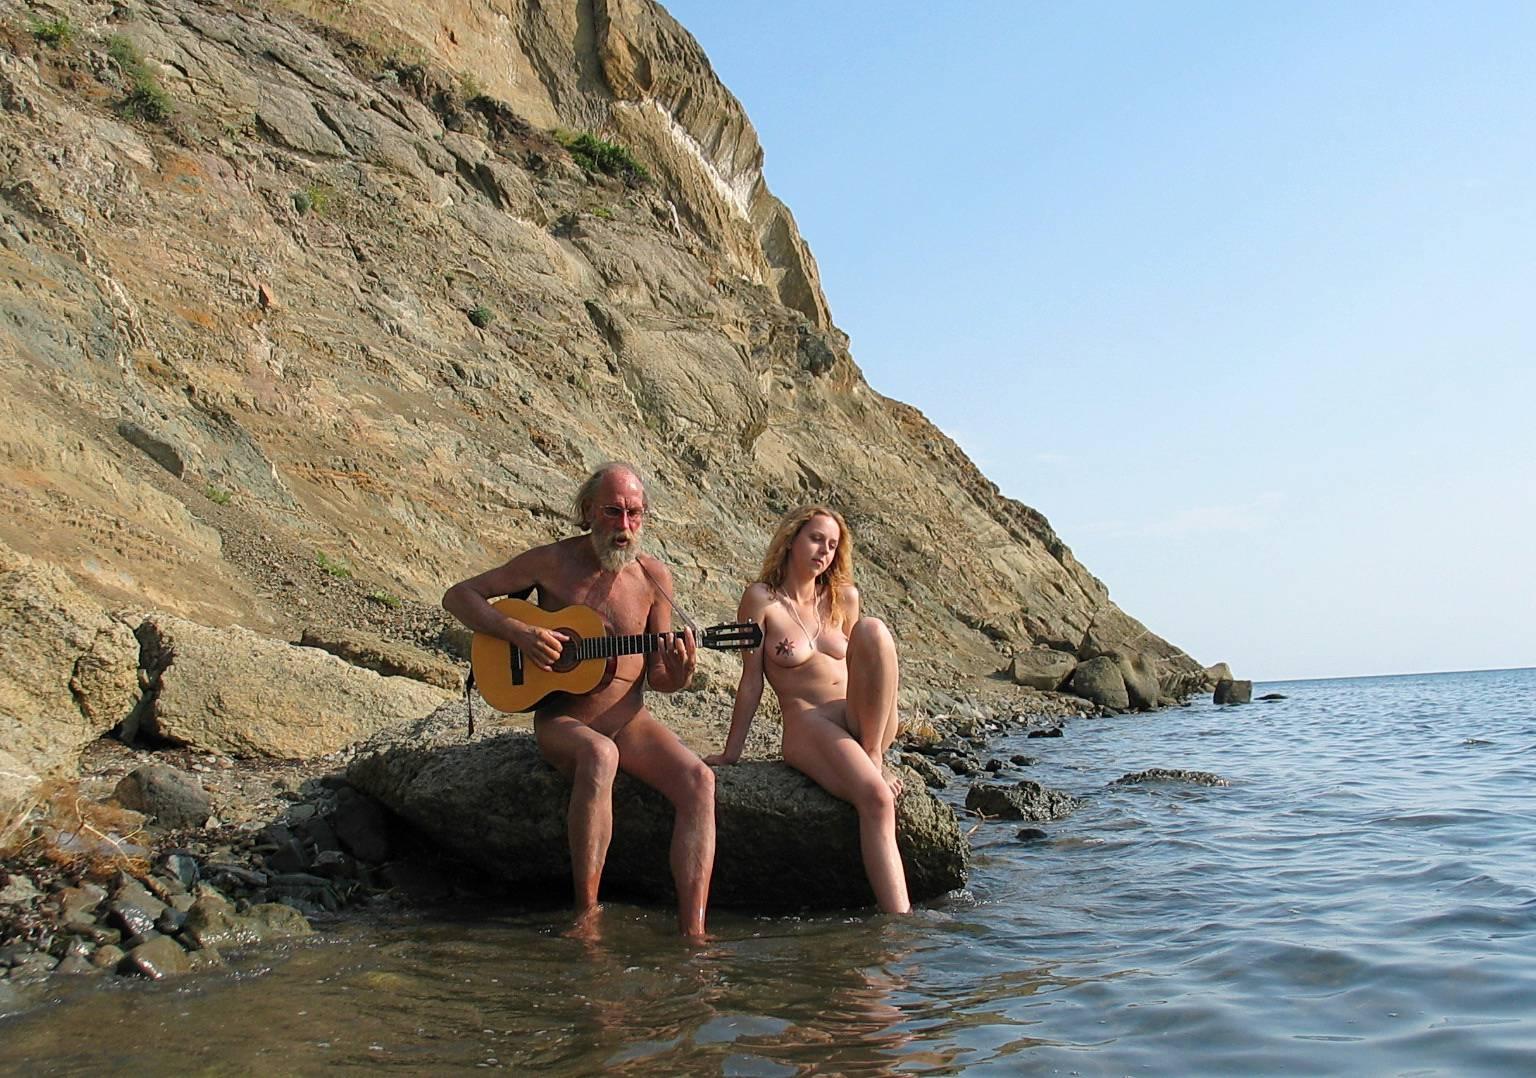 Purenudism Gallery-Guitarists Beach Tunes - 2